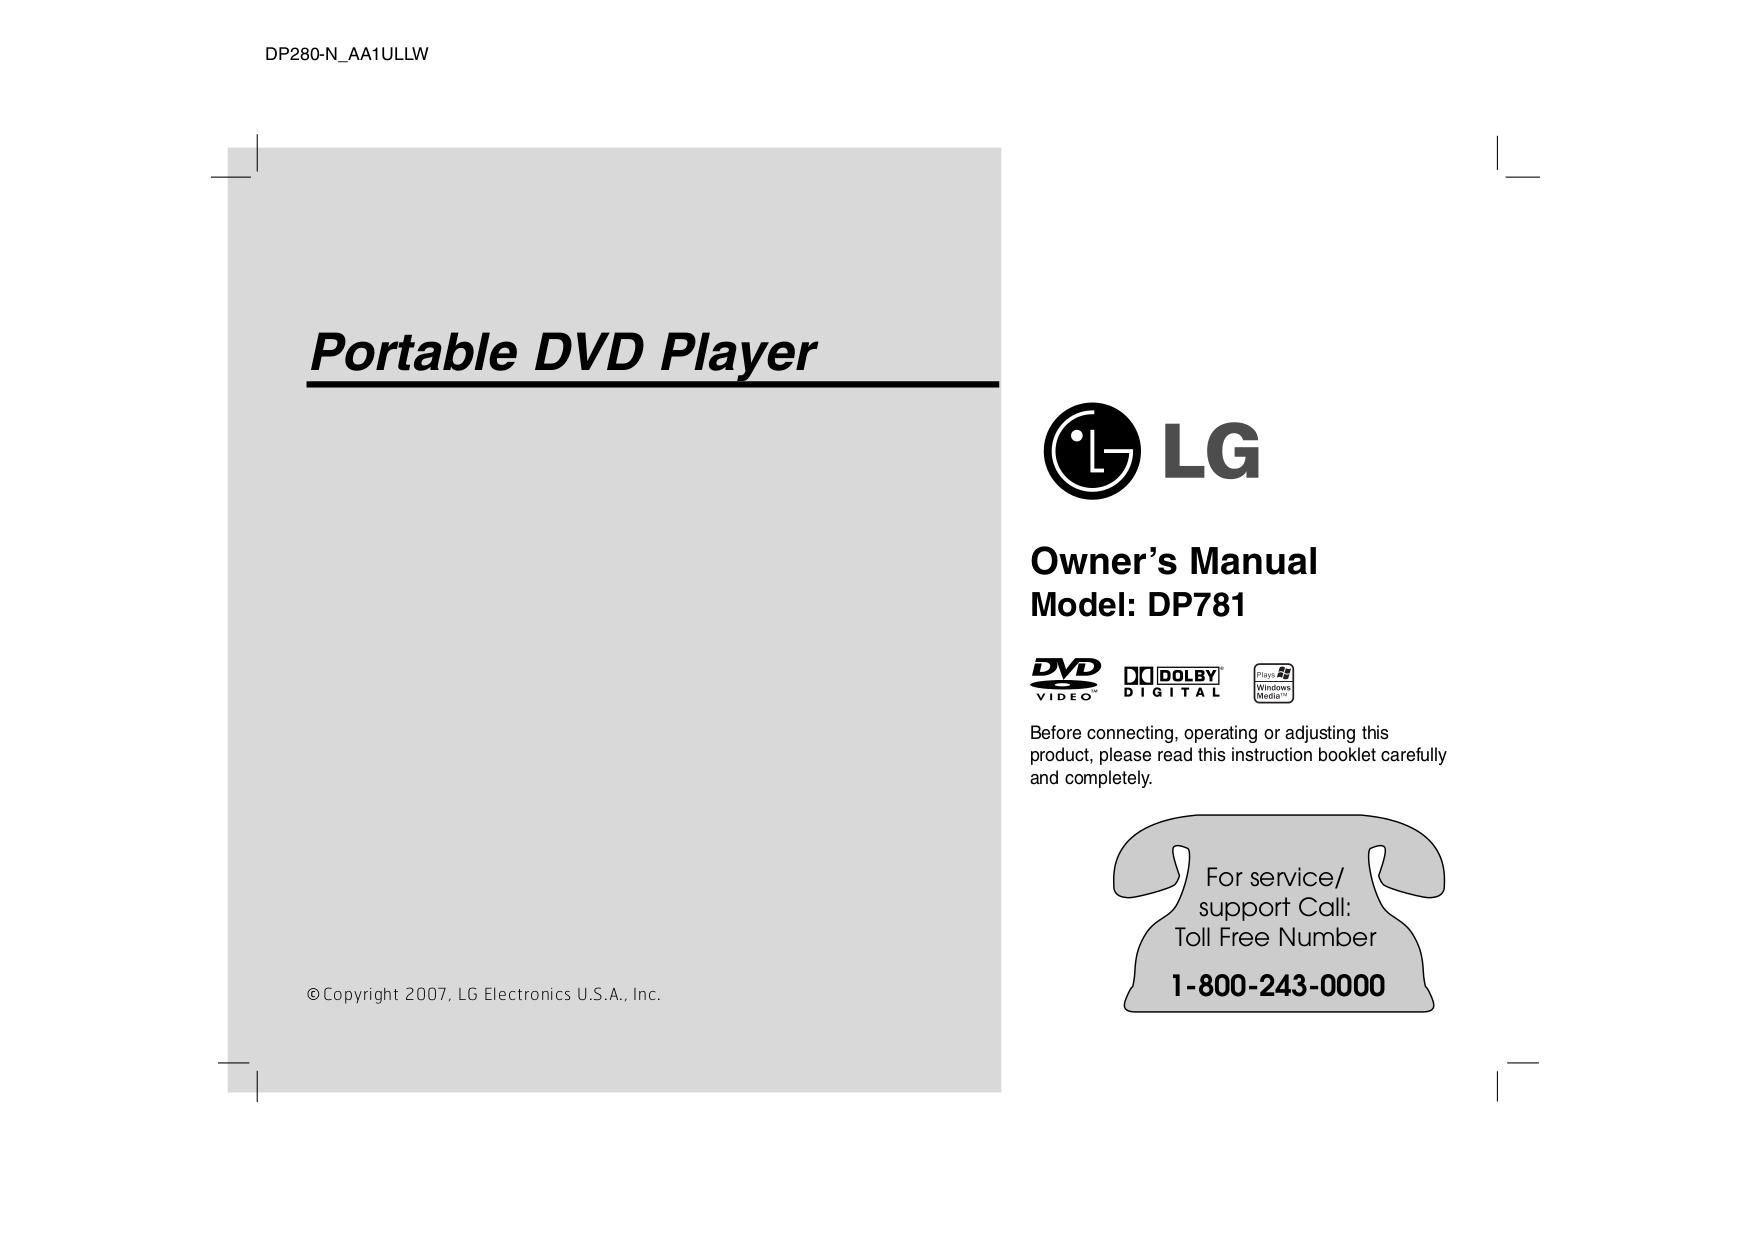 pdf for LG Portable DVD Player DP781 manual